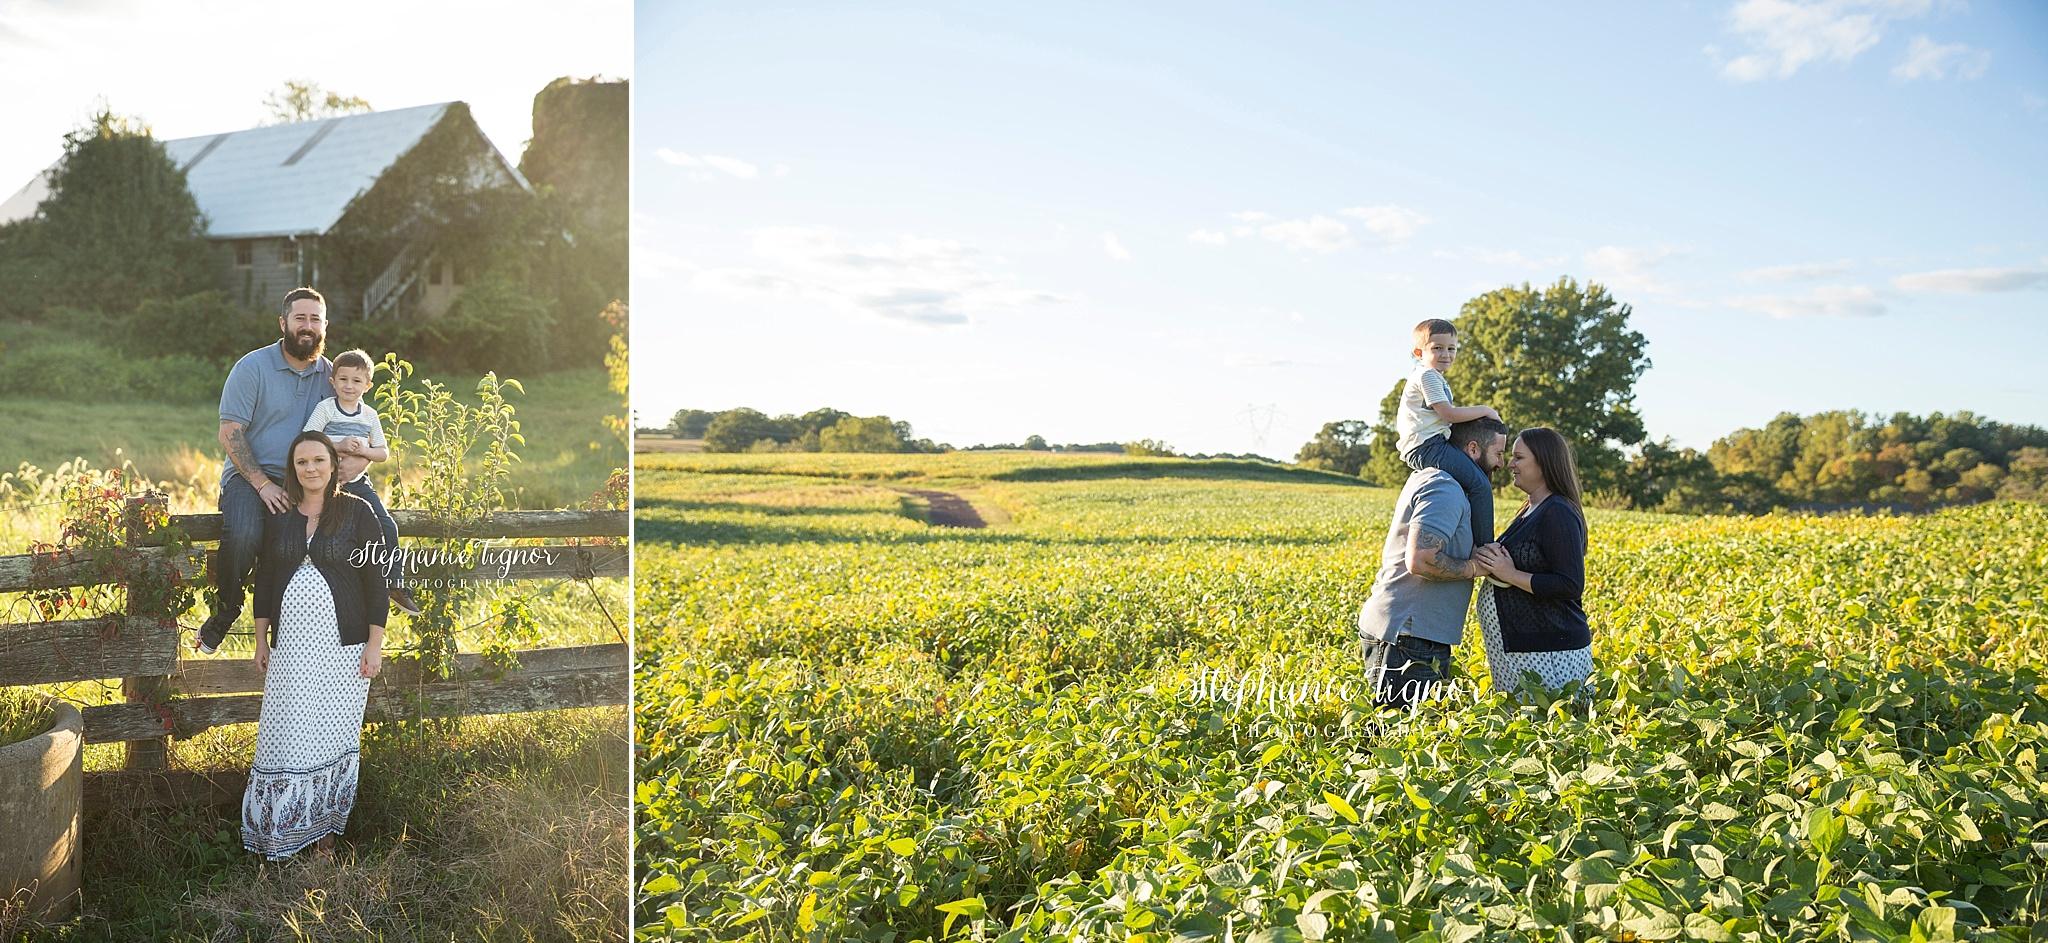 Stephanie Tignor Photography | Fredericksburg VA Maternity Photographer | Warrenton VA Maternity Photographer | Stafford VA Maternity Photographer | Maternity Photographer